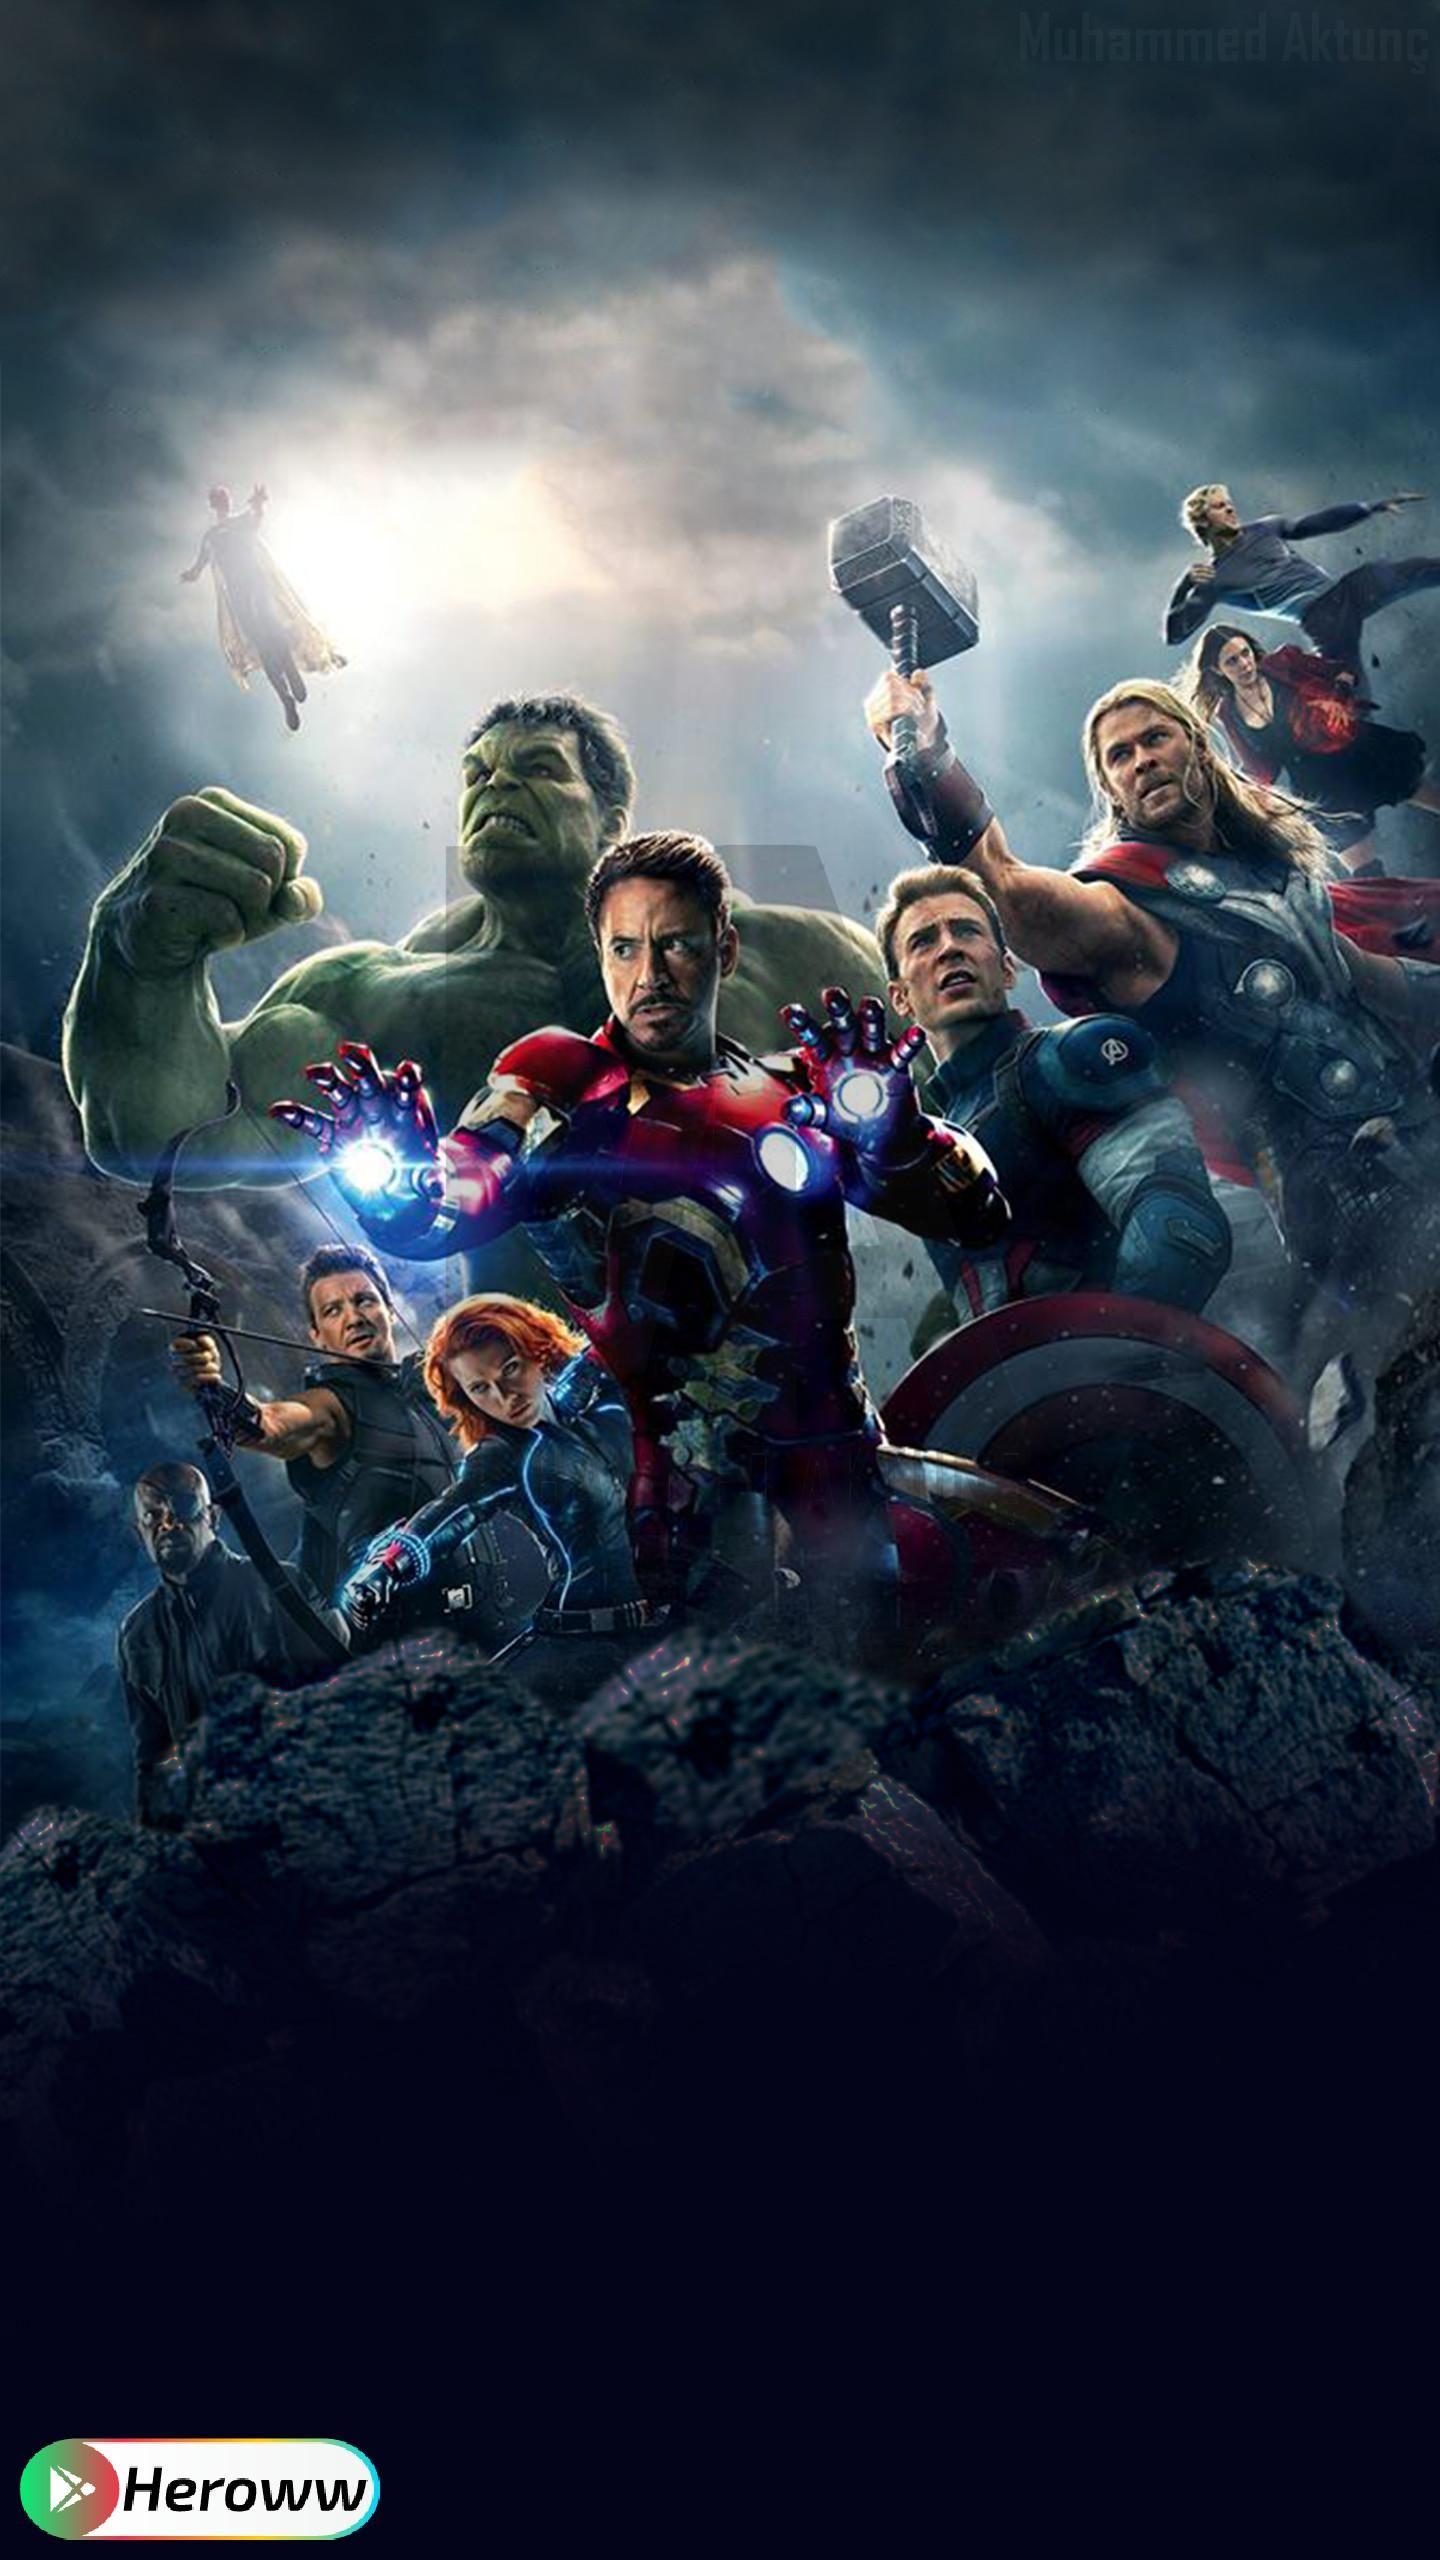 Heroww Superhero Wallpapers Hd 2k 4k Live Wallpaper Is Provided By Weblywork We Re Uploading A Marvel Phone Wallpaper Avengers Pictures Avengers Wallpaper